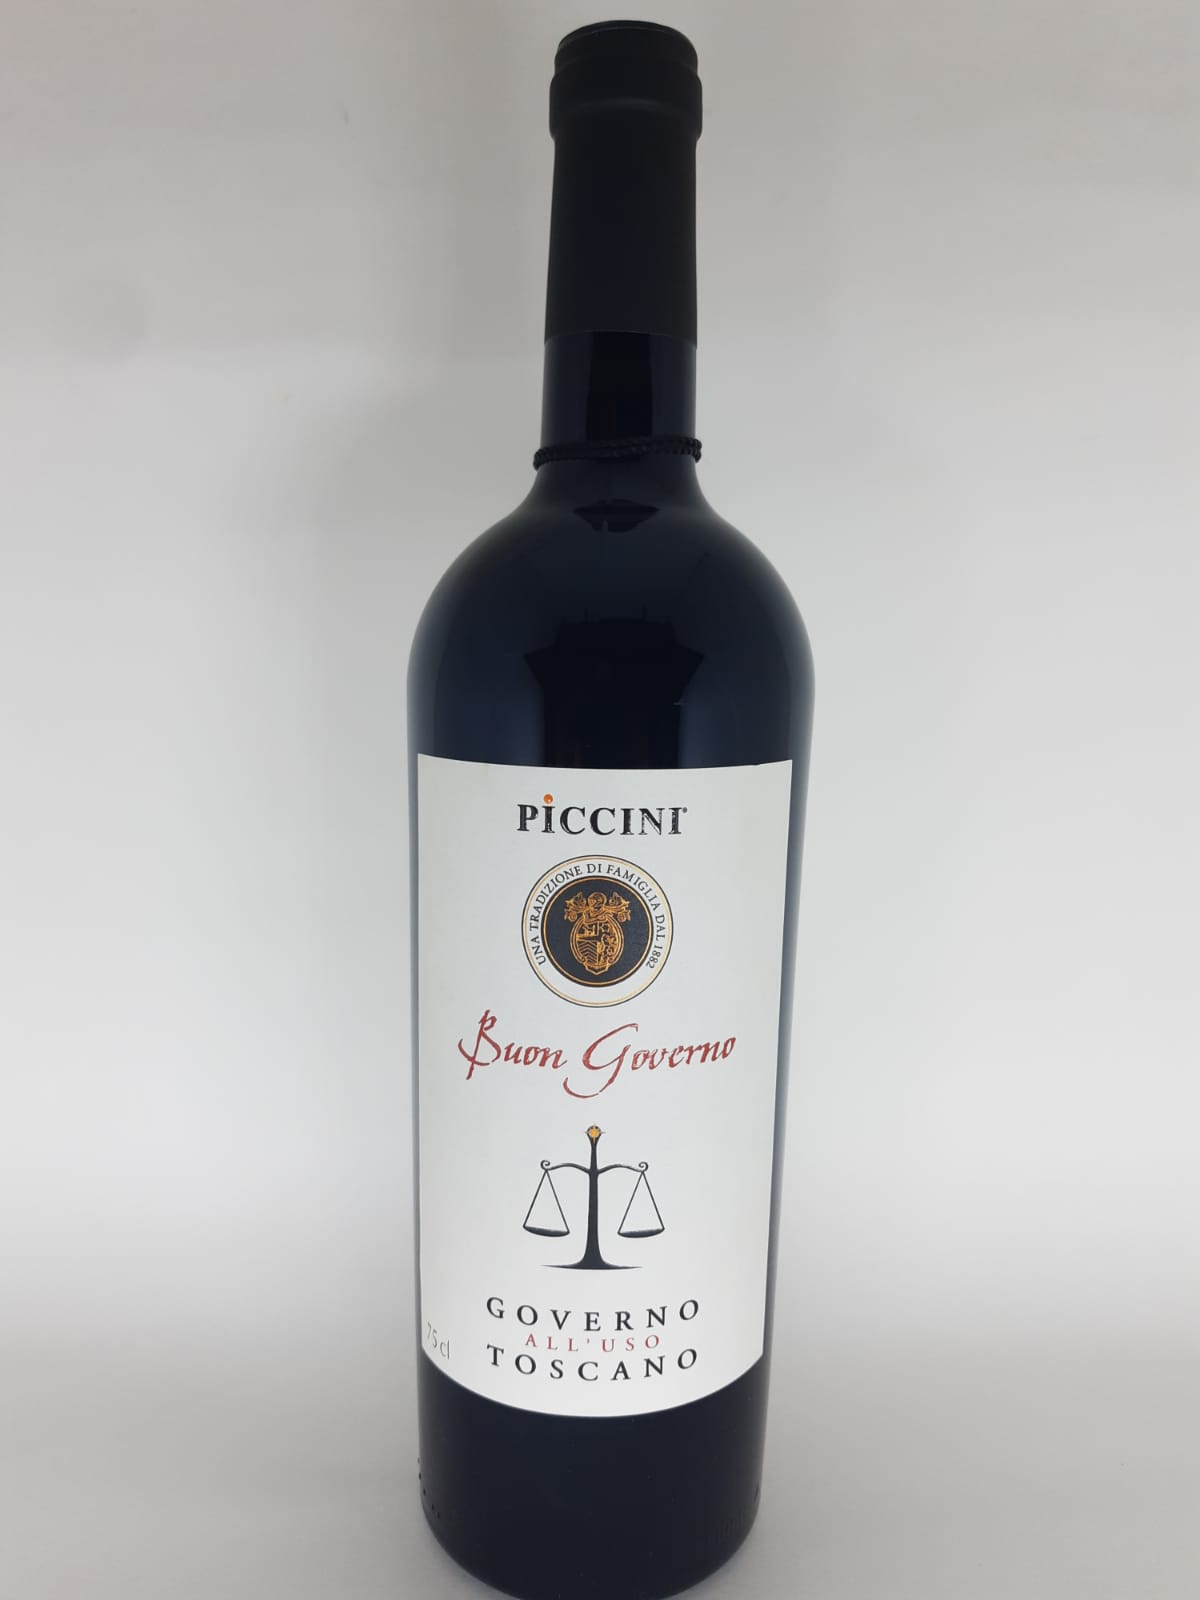 Vinho Piccini Buon Governo 750ml